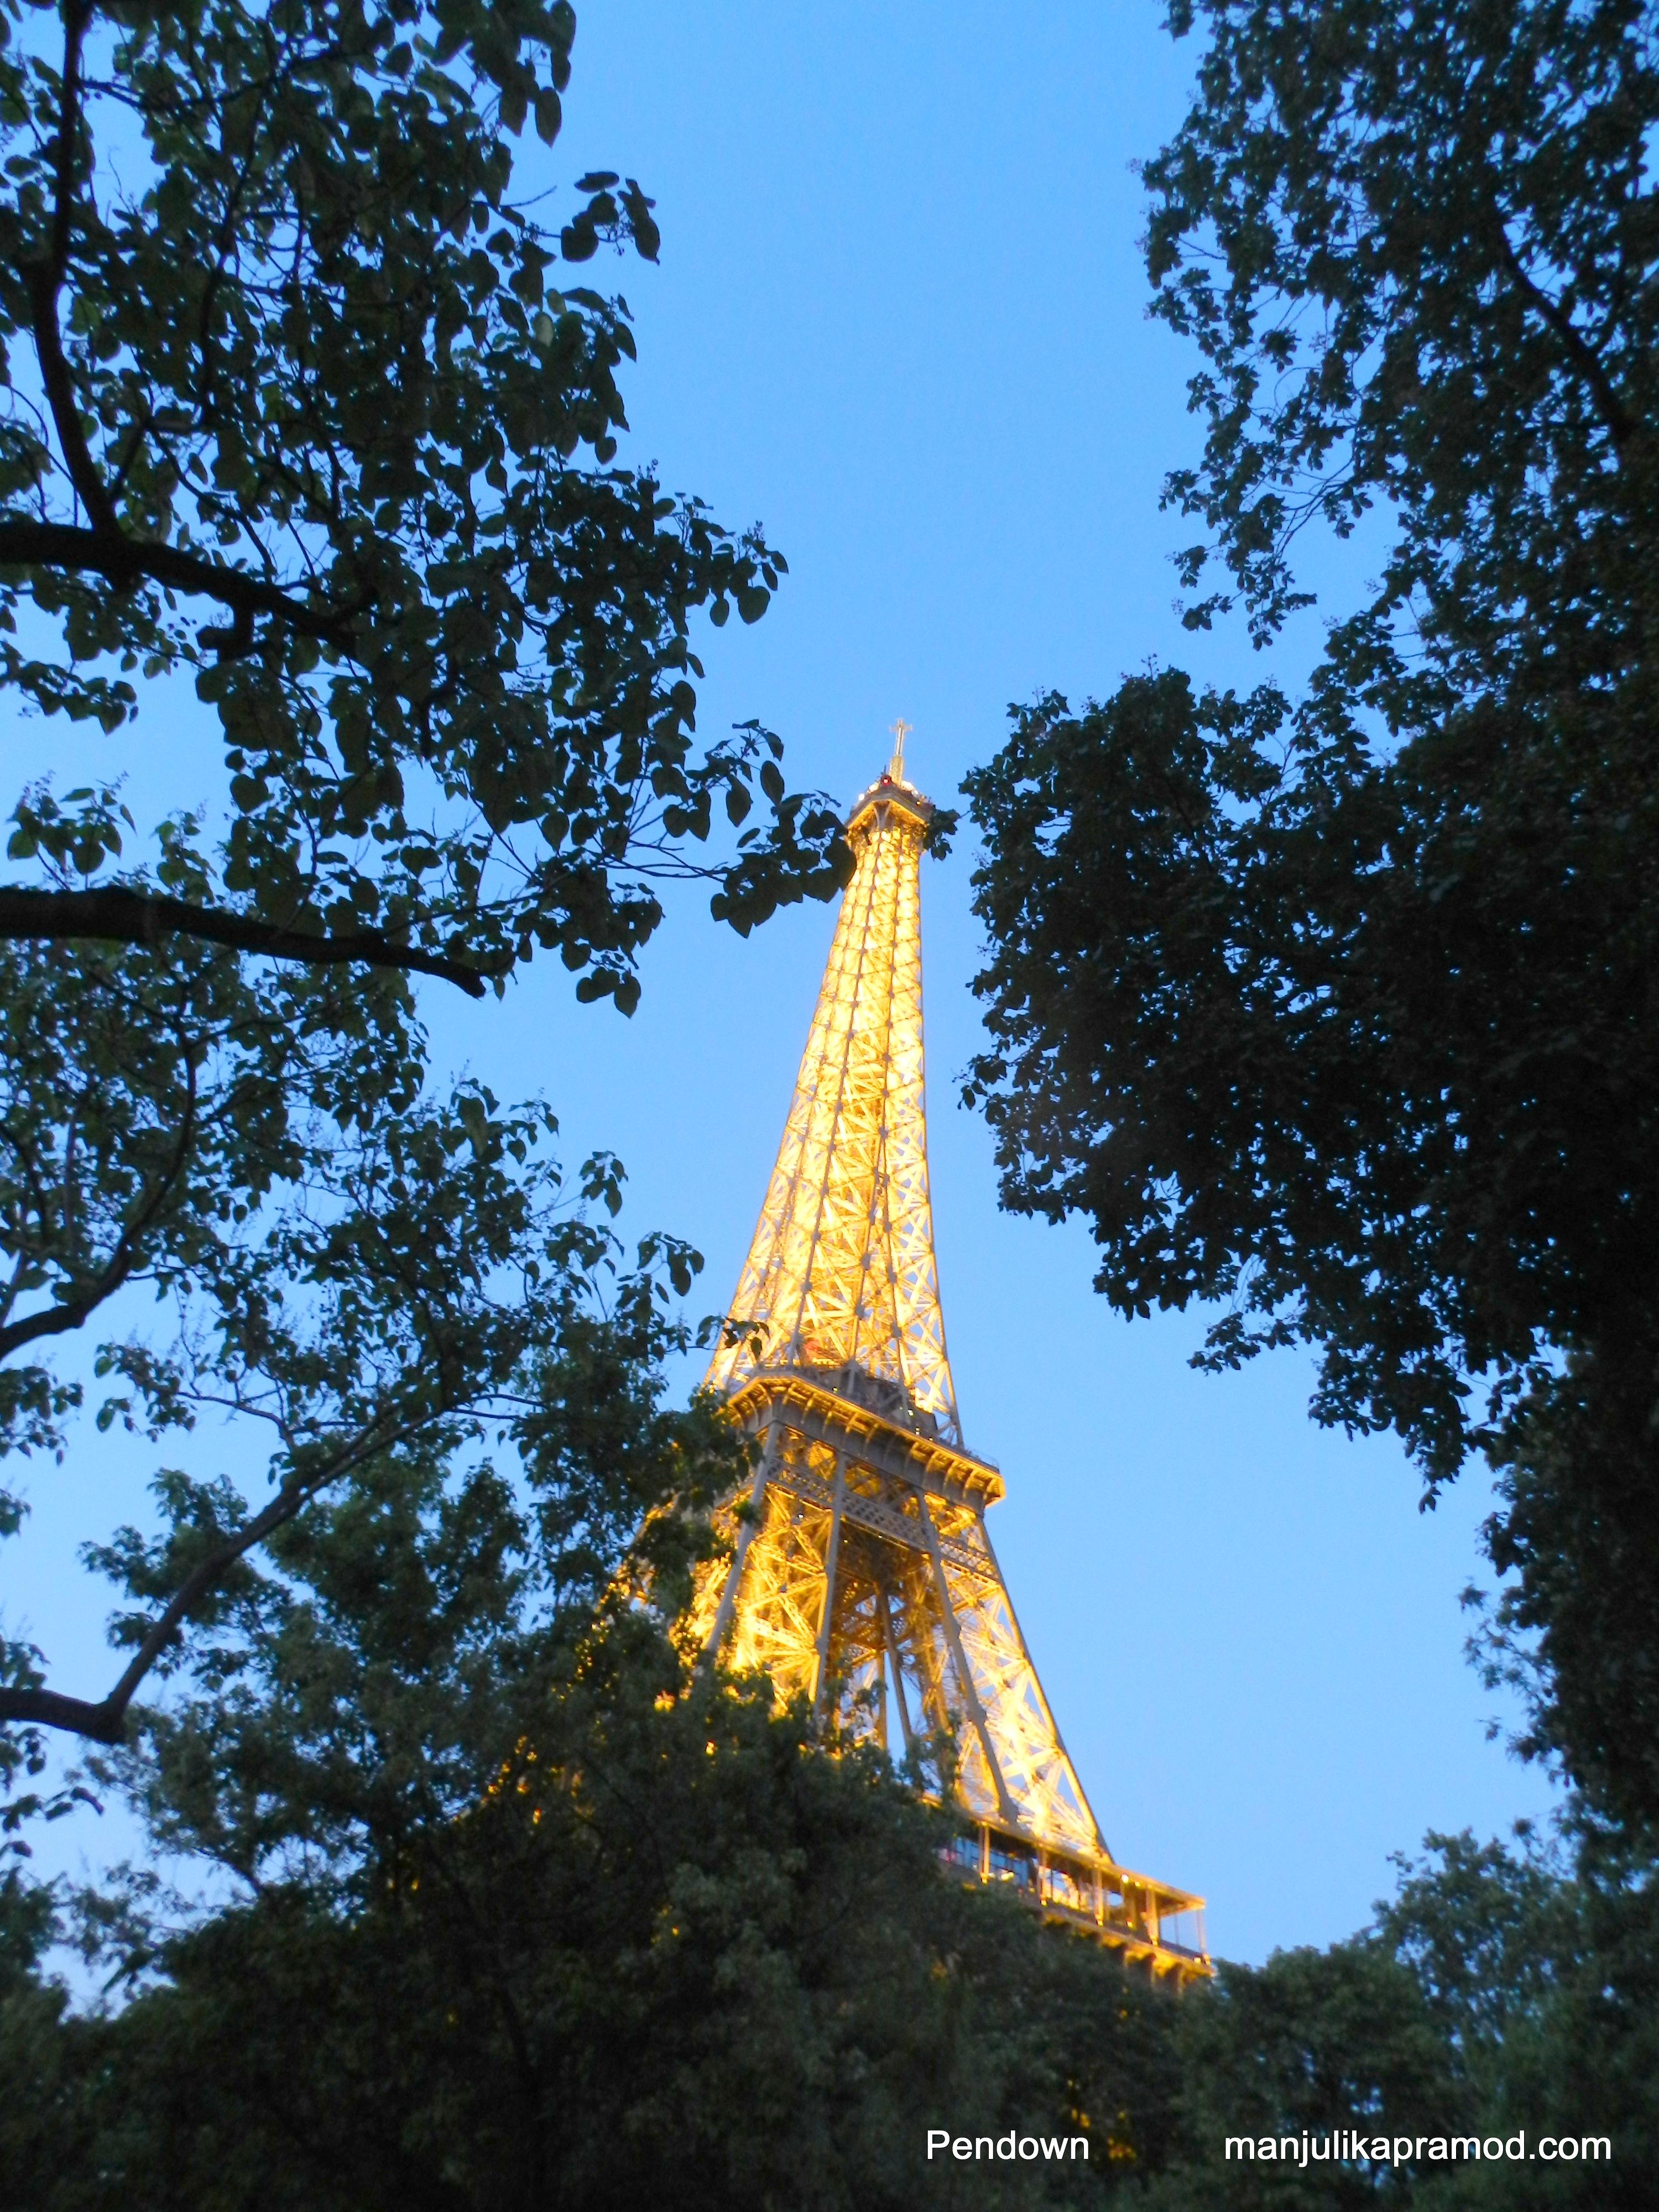 Eiffel Tower, Iron Lady, Paris, Farnce, Travel, Europe